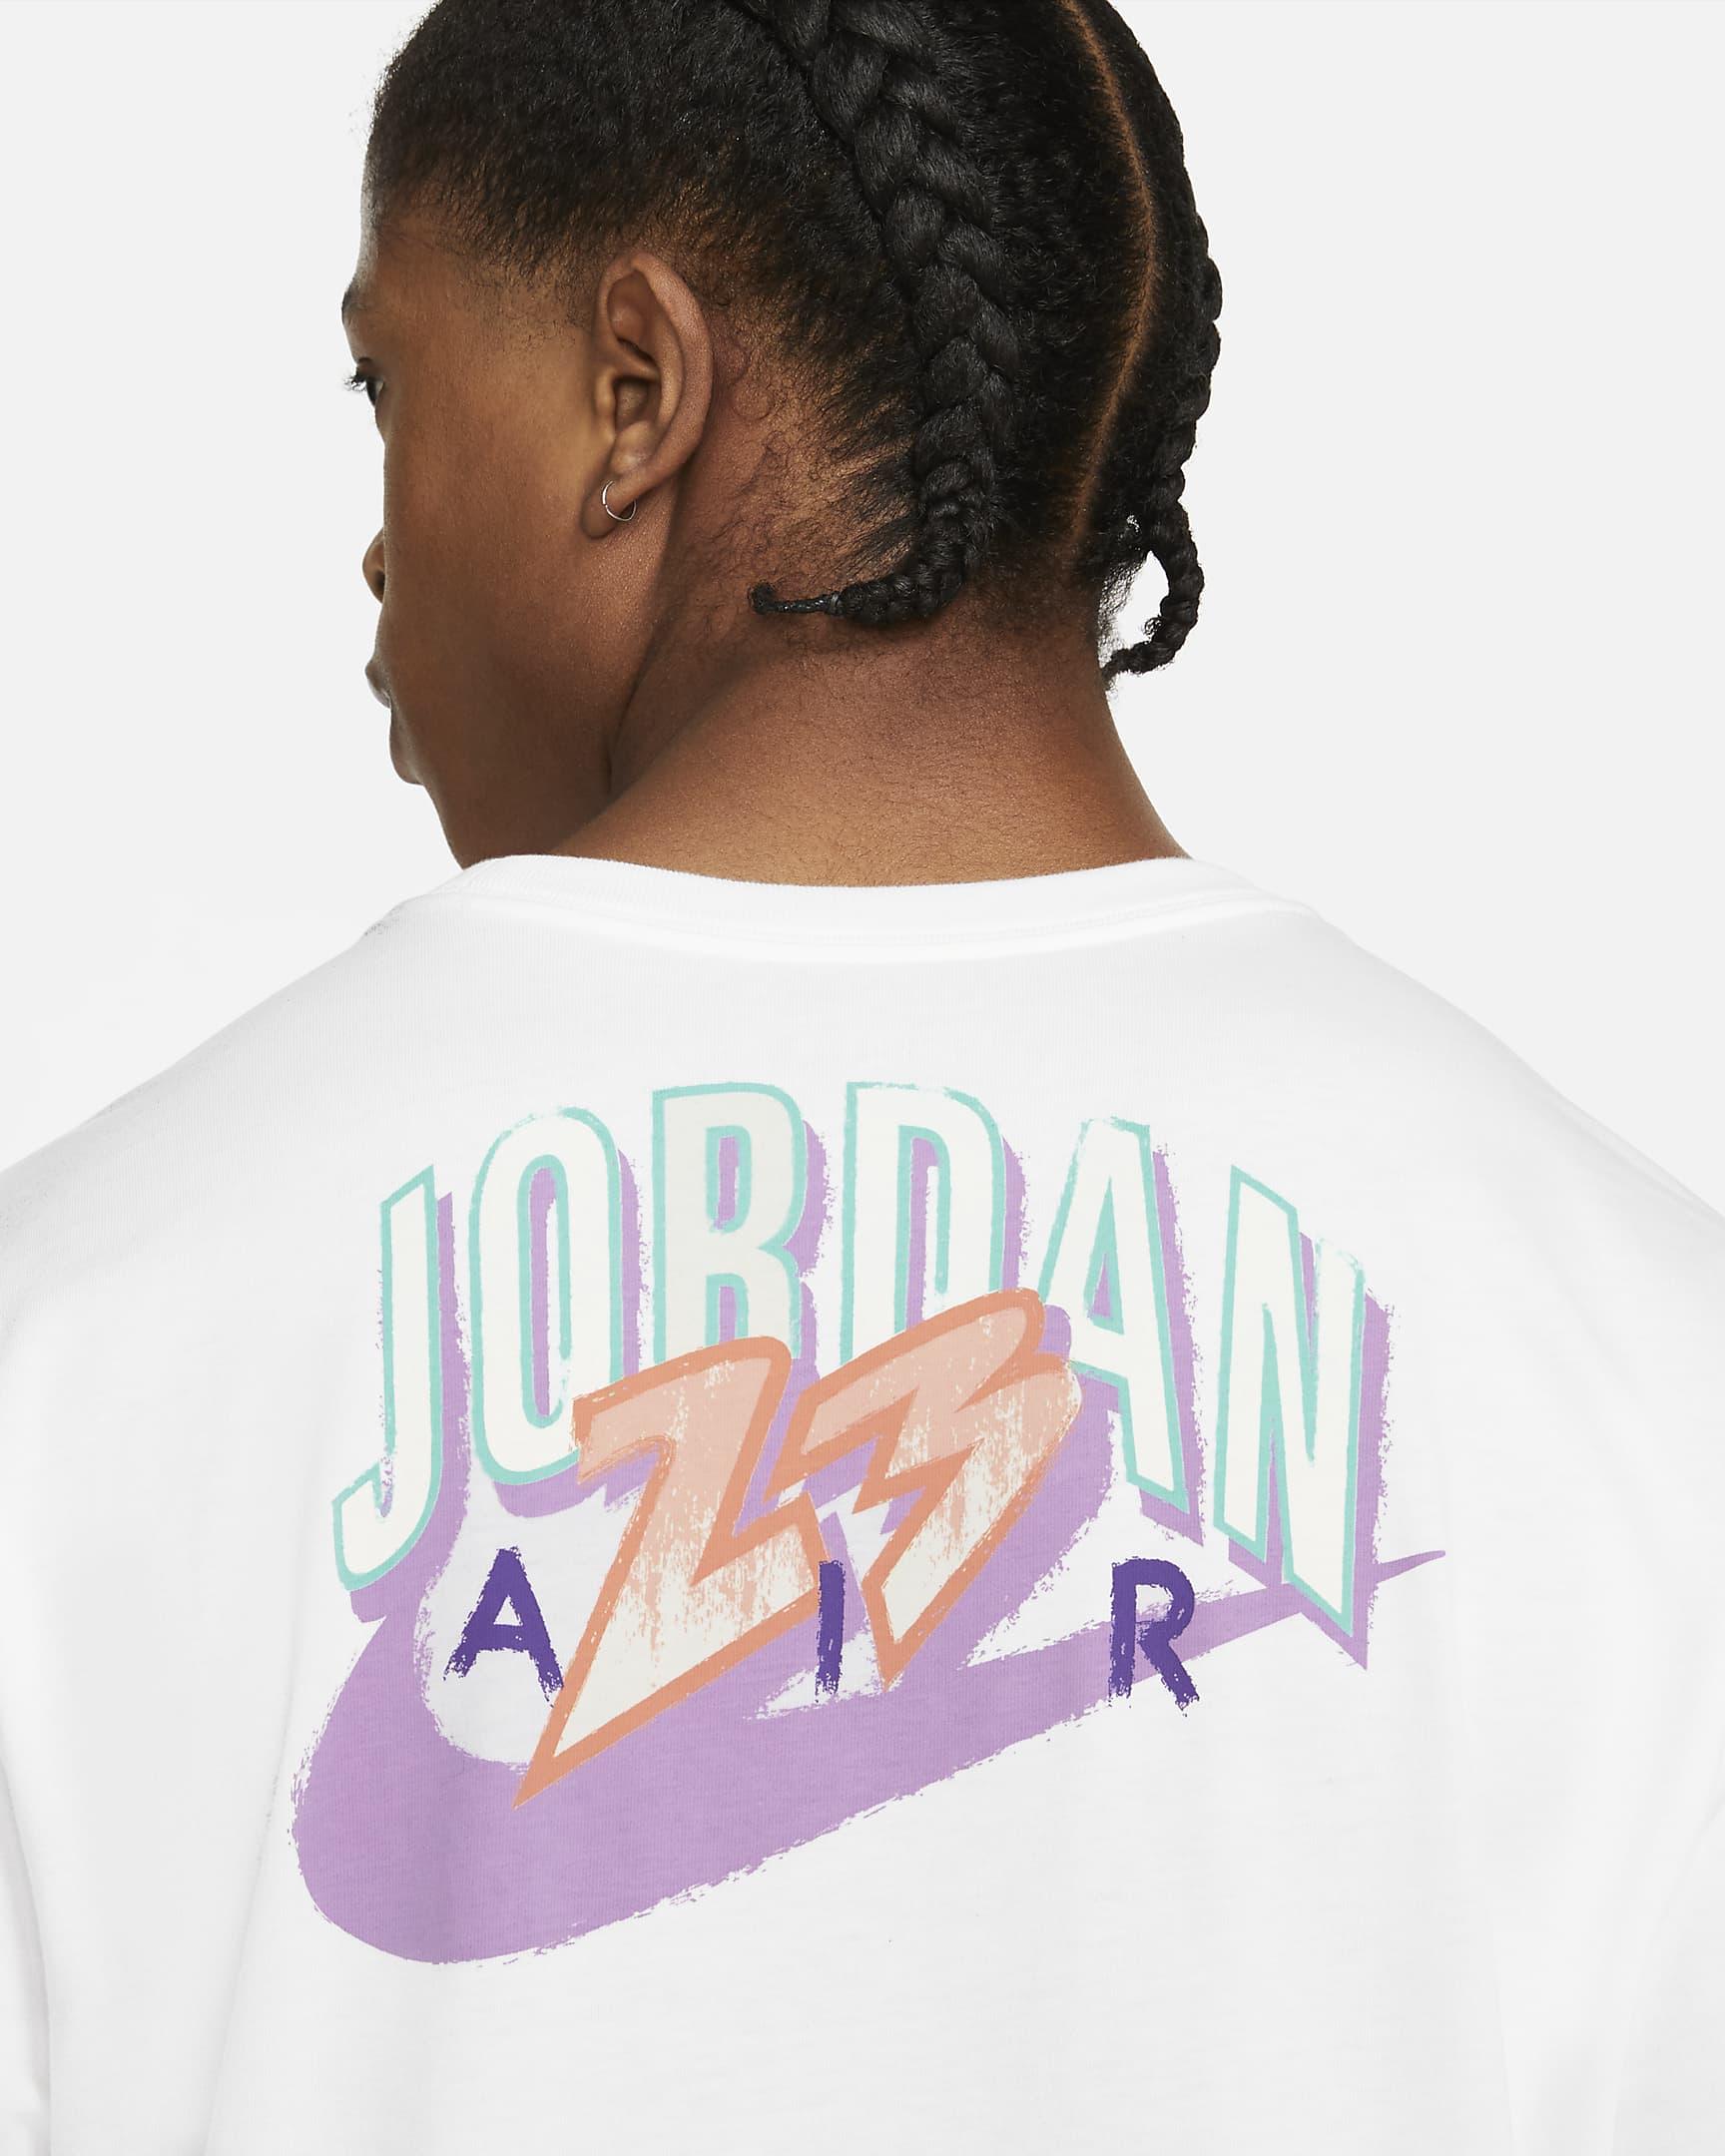 jordan-23-swoosh-mens-short-sleeve-t-shirt-2nxH4t-3.png